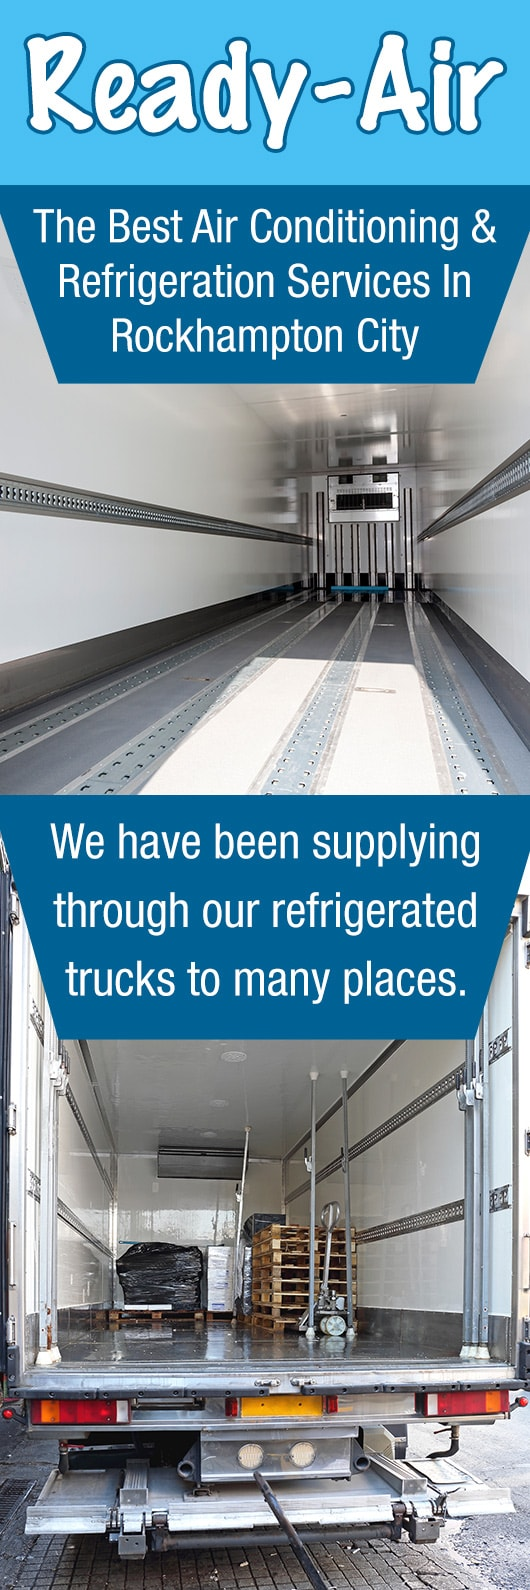 ready-air - refrigerated transport vans & trucks - 242 alma st